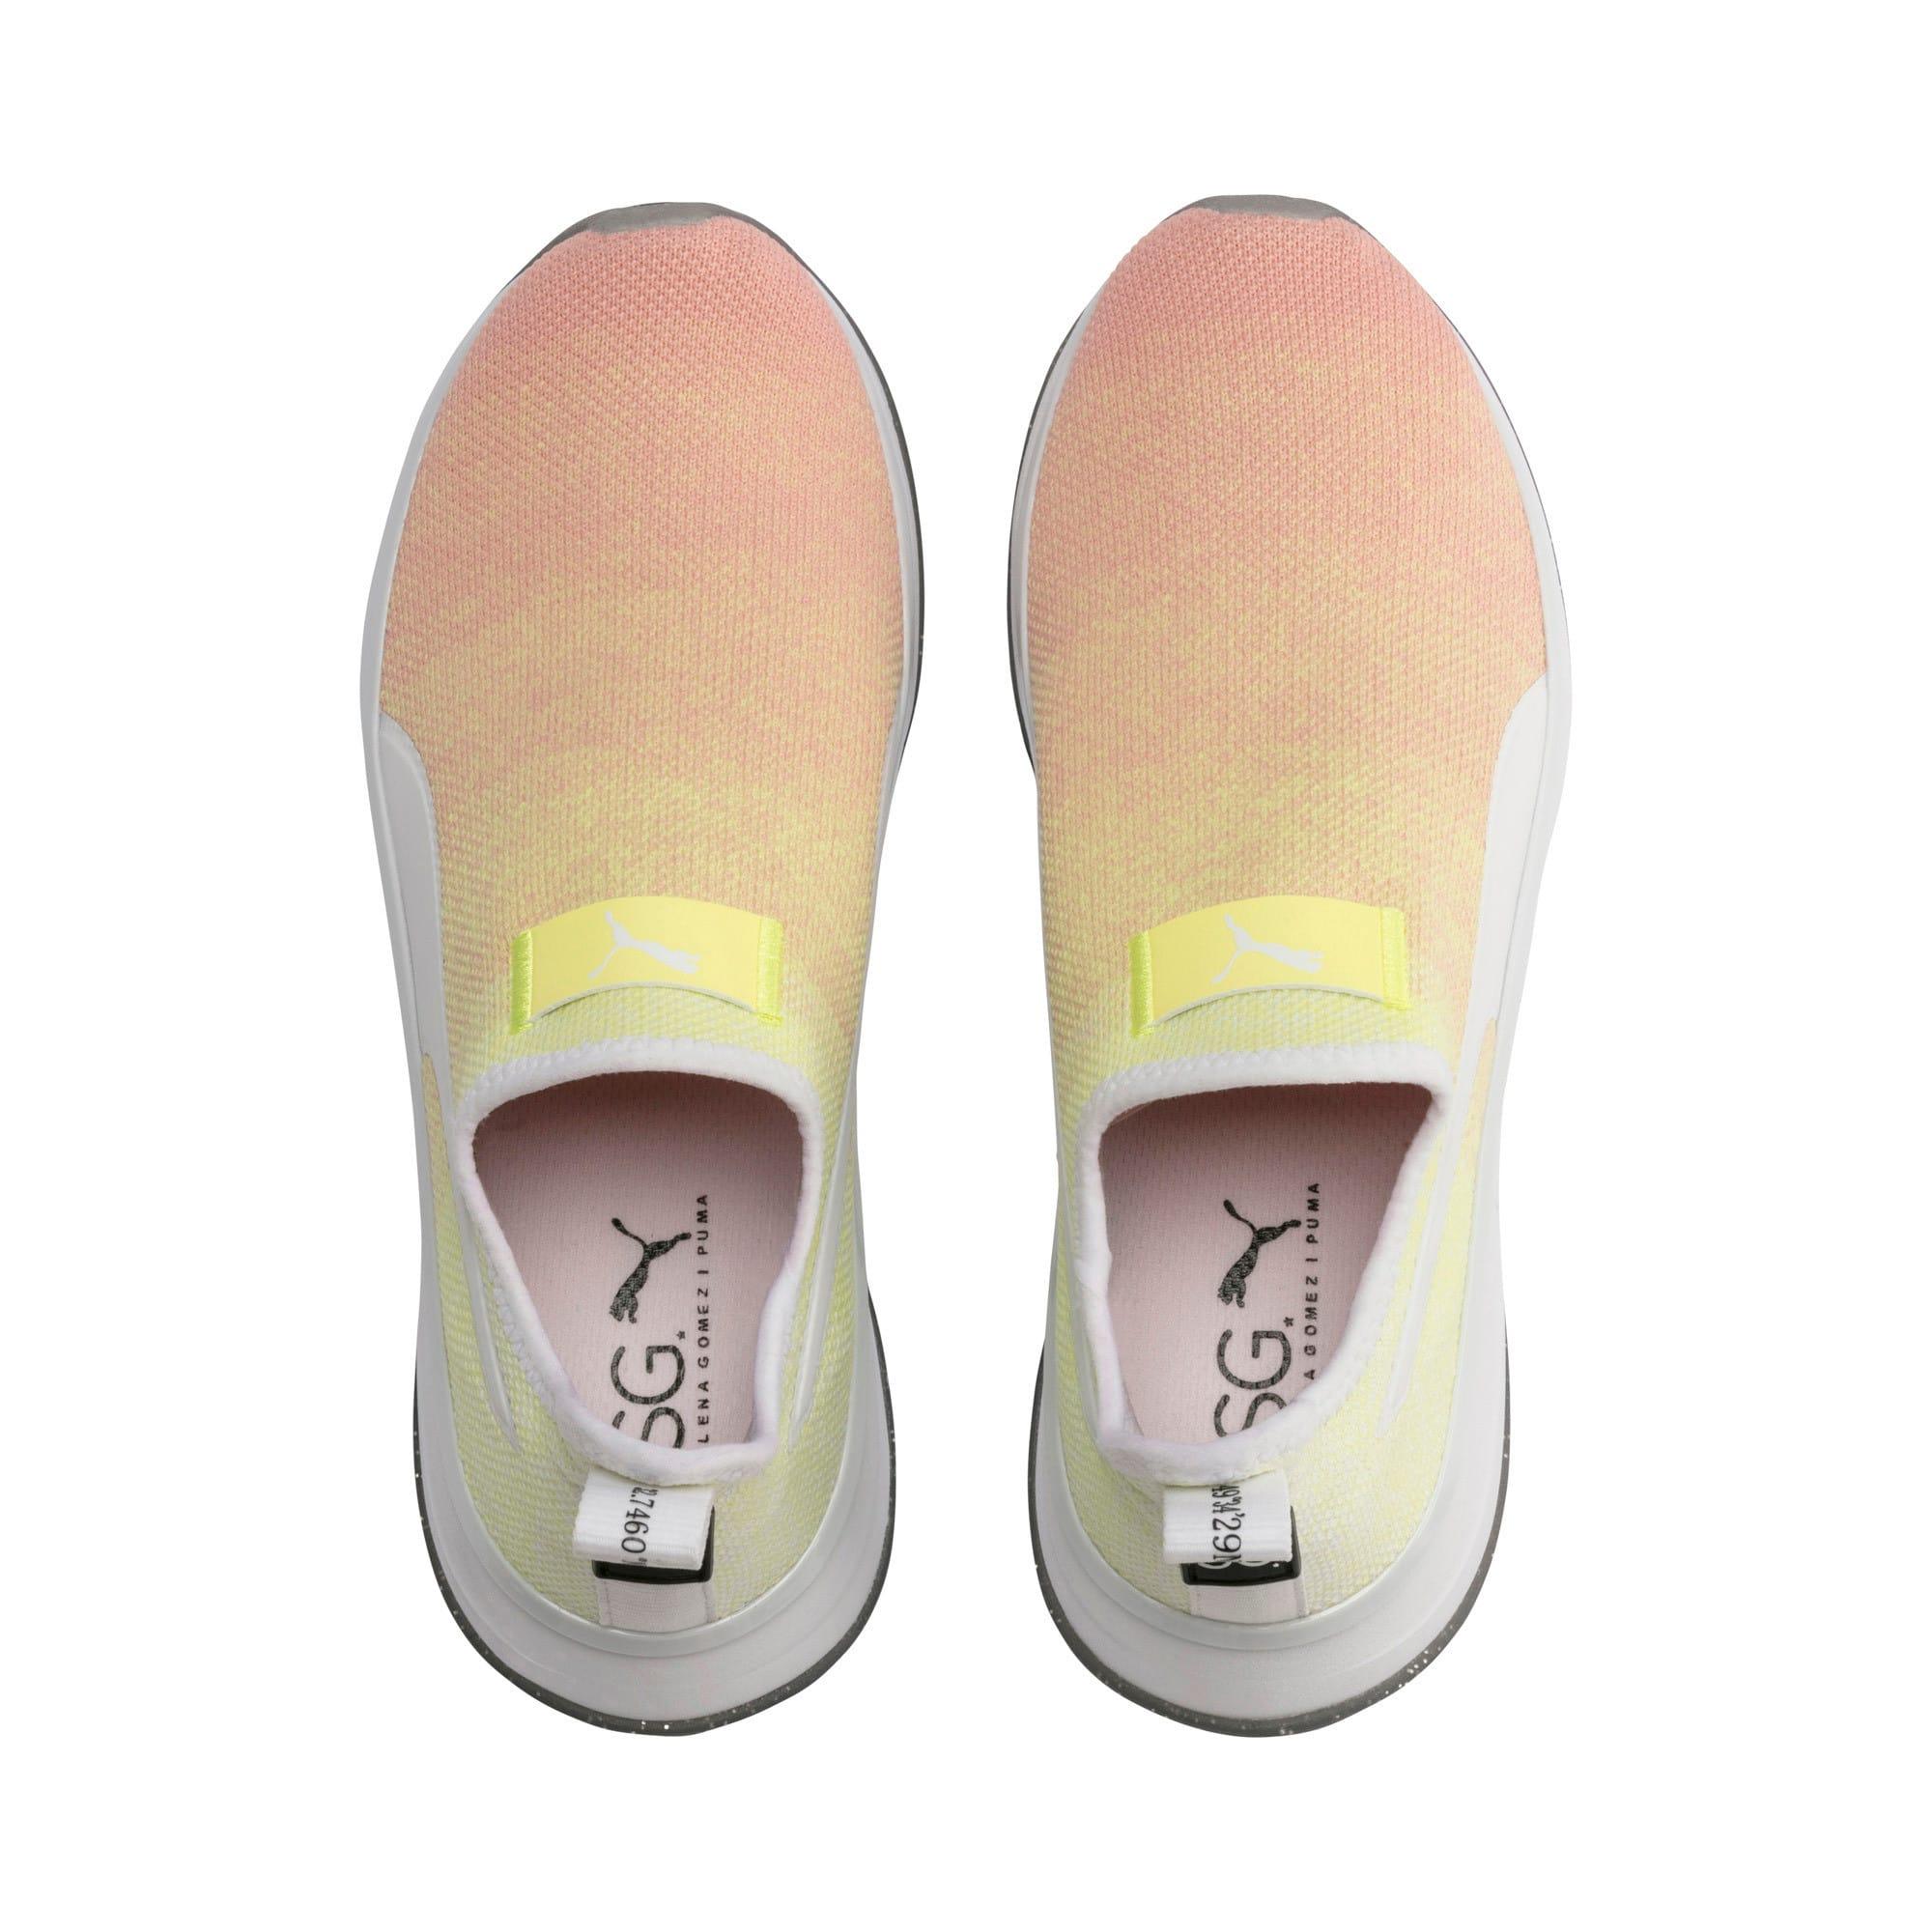 Thumbnail 7 of PUMA x SELENA GOMEZ Slip-On Gradient Women's Training Shoes, YELLOW-Peach Bud-White, medium